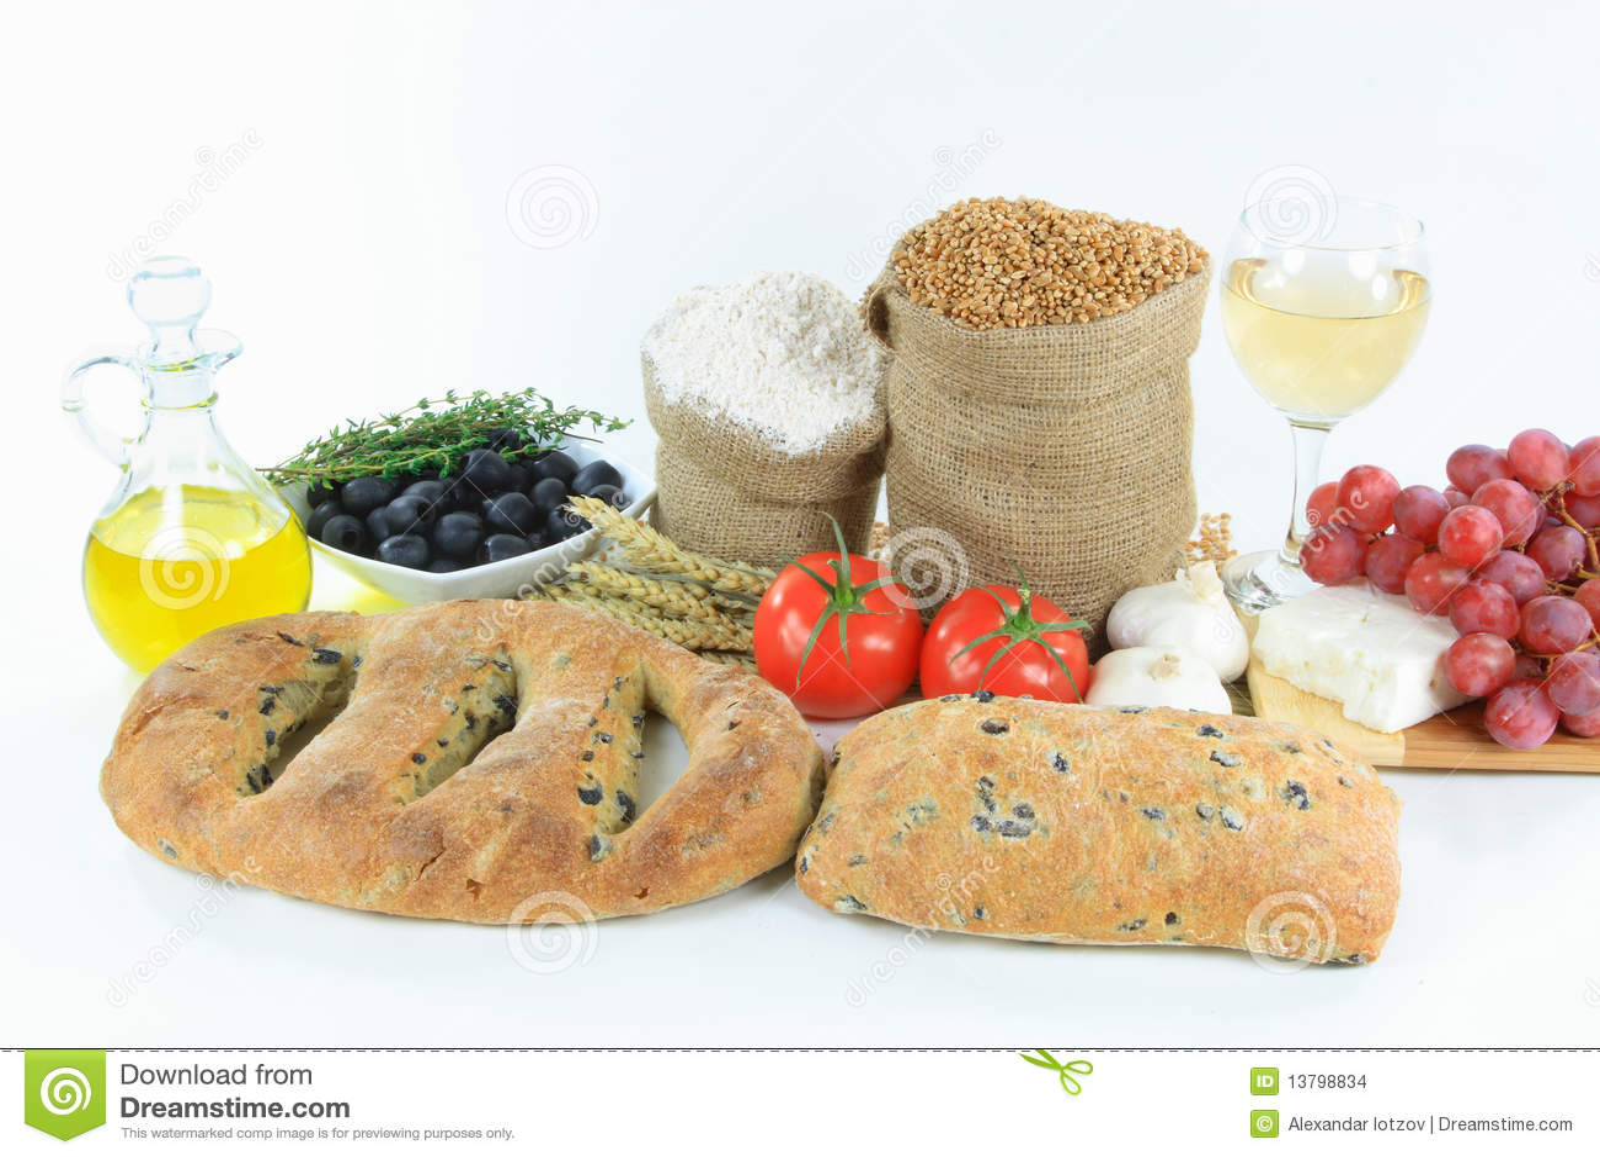 Artisan bread business plan